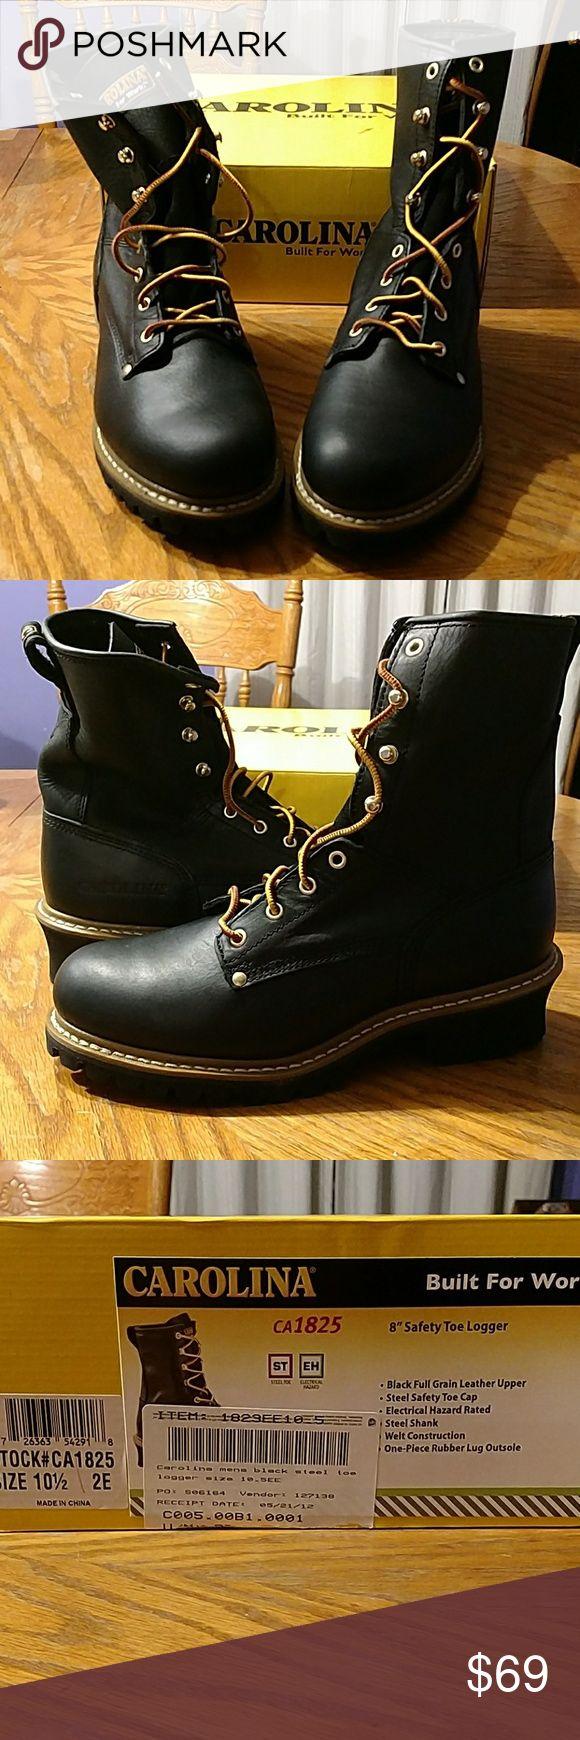 NIB CAROLINA STEEL TOE BOOTS Black leather steel toe work boots Never worn Carolina Shoes Boots